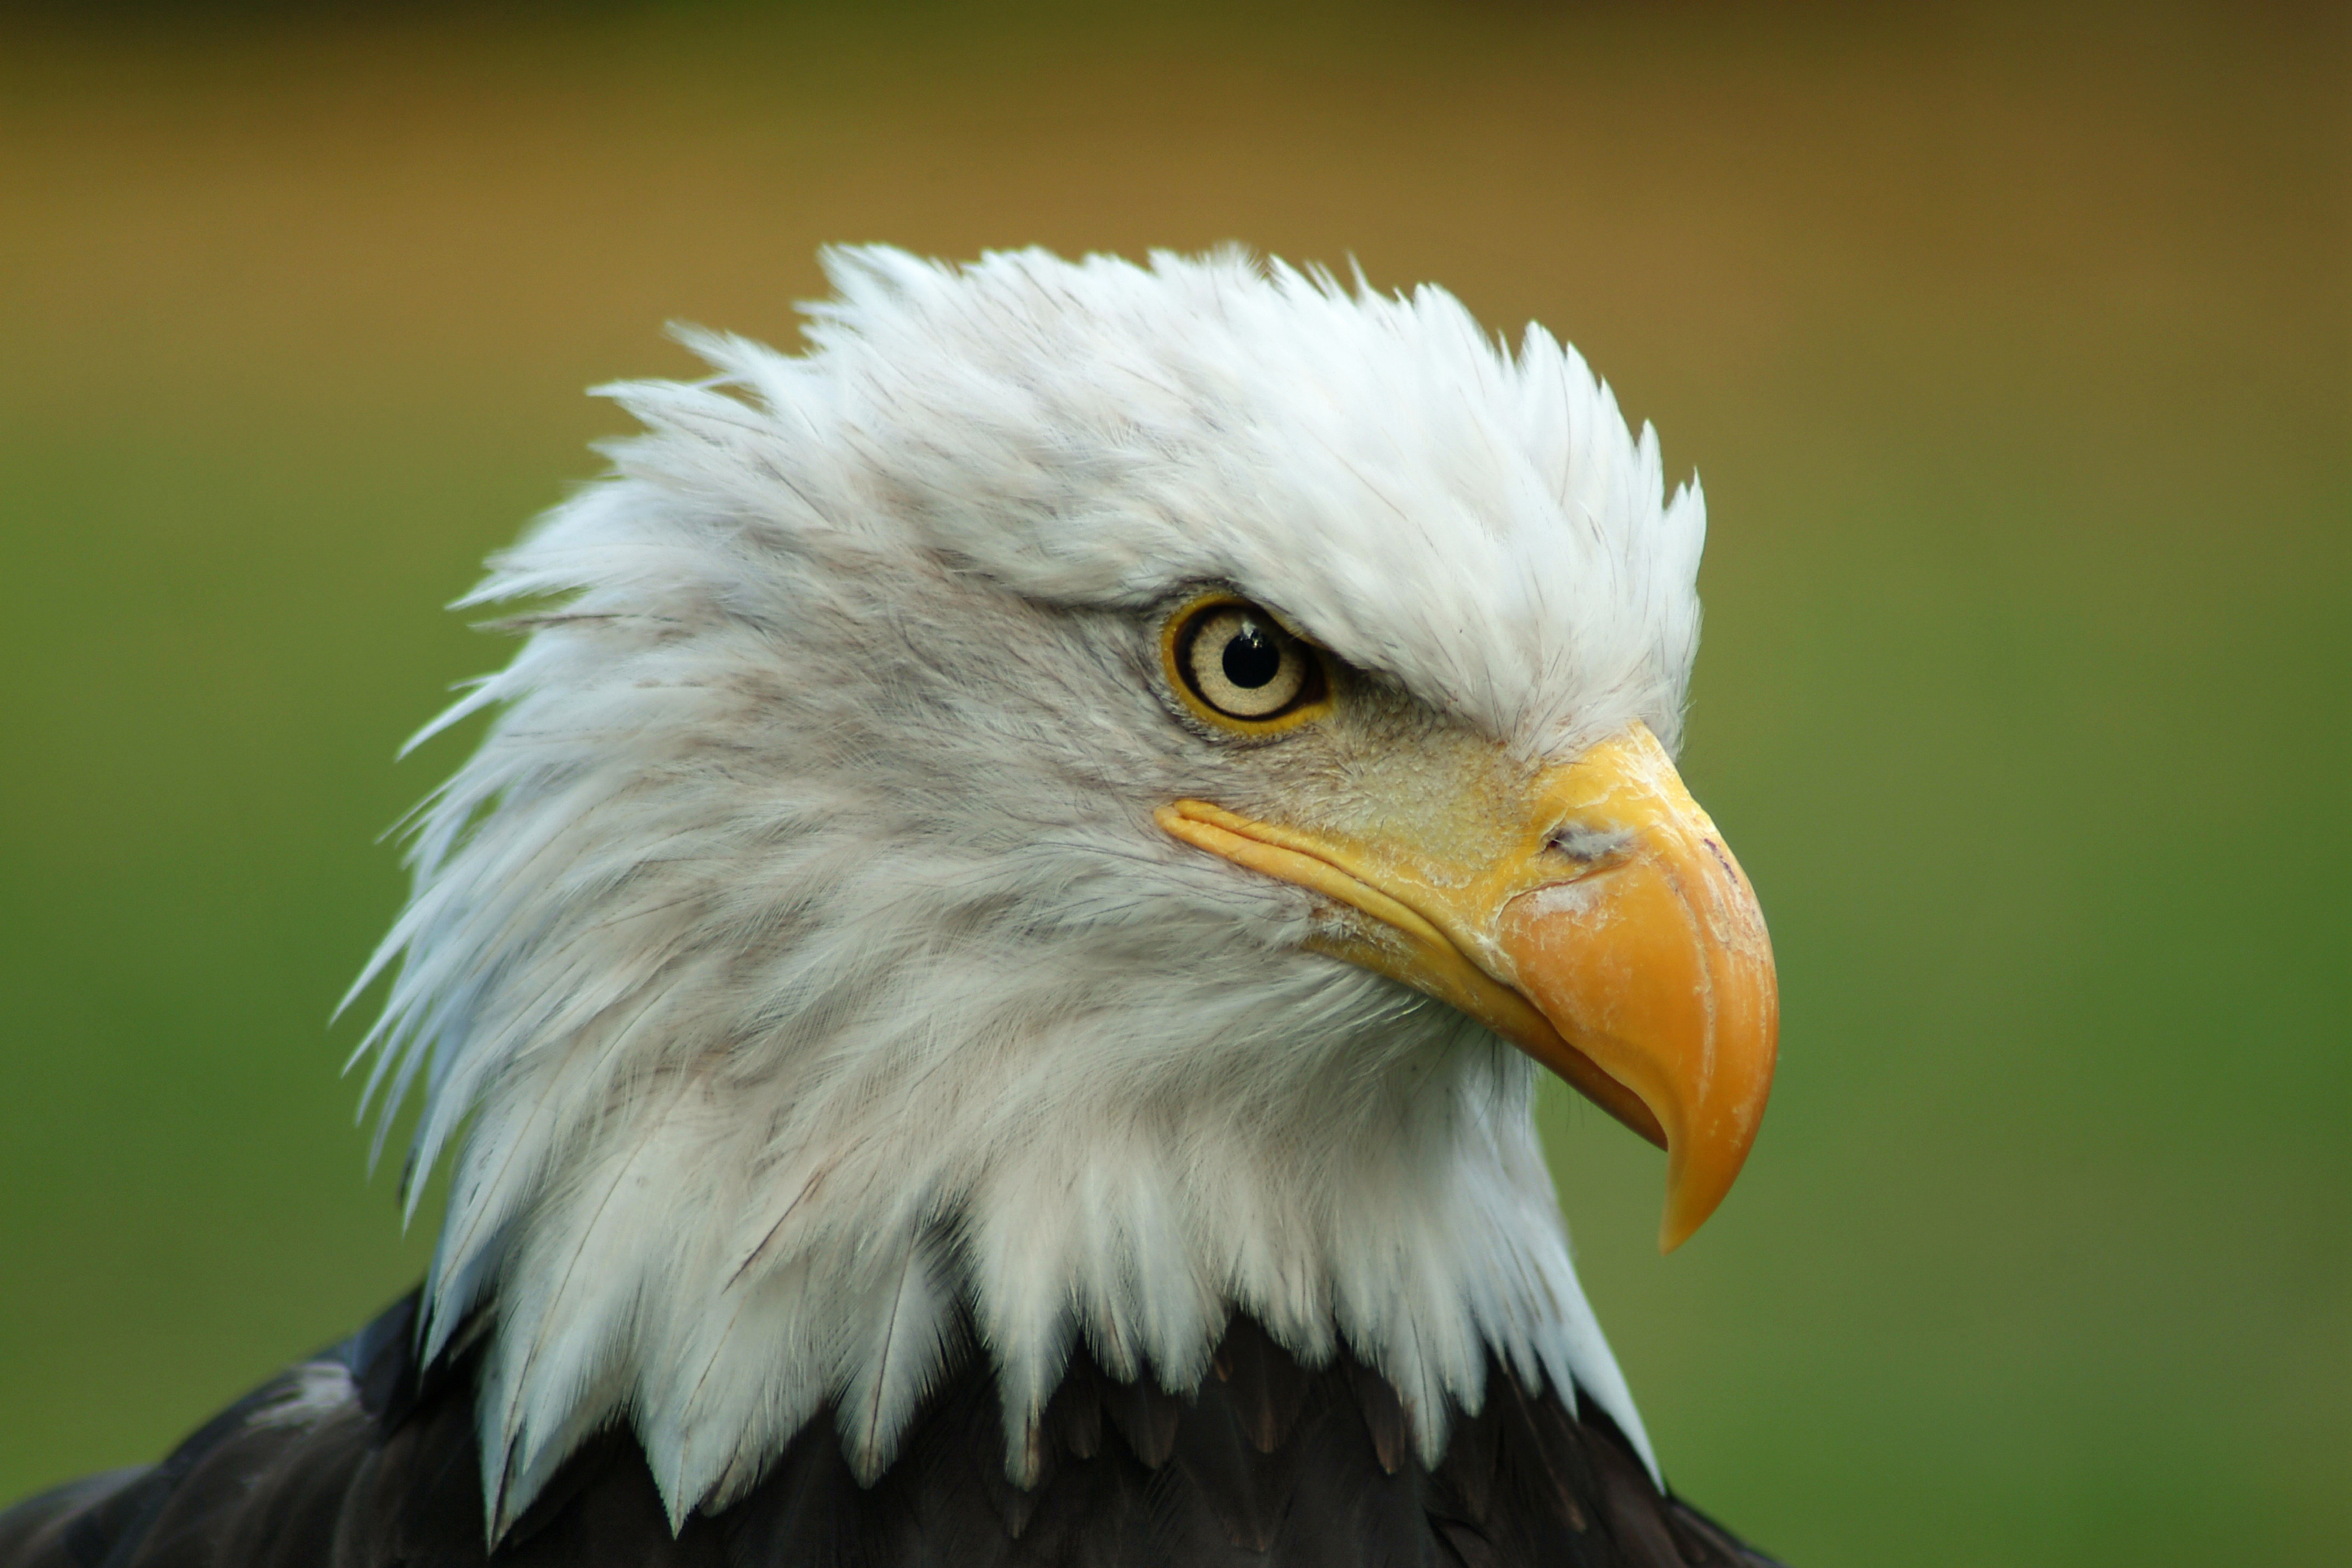 File:Bald Eagle Head.jpg - Wikimedia Commons